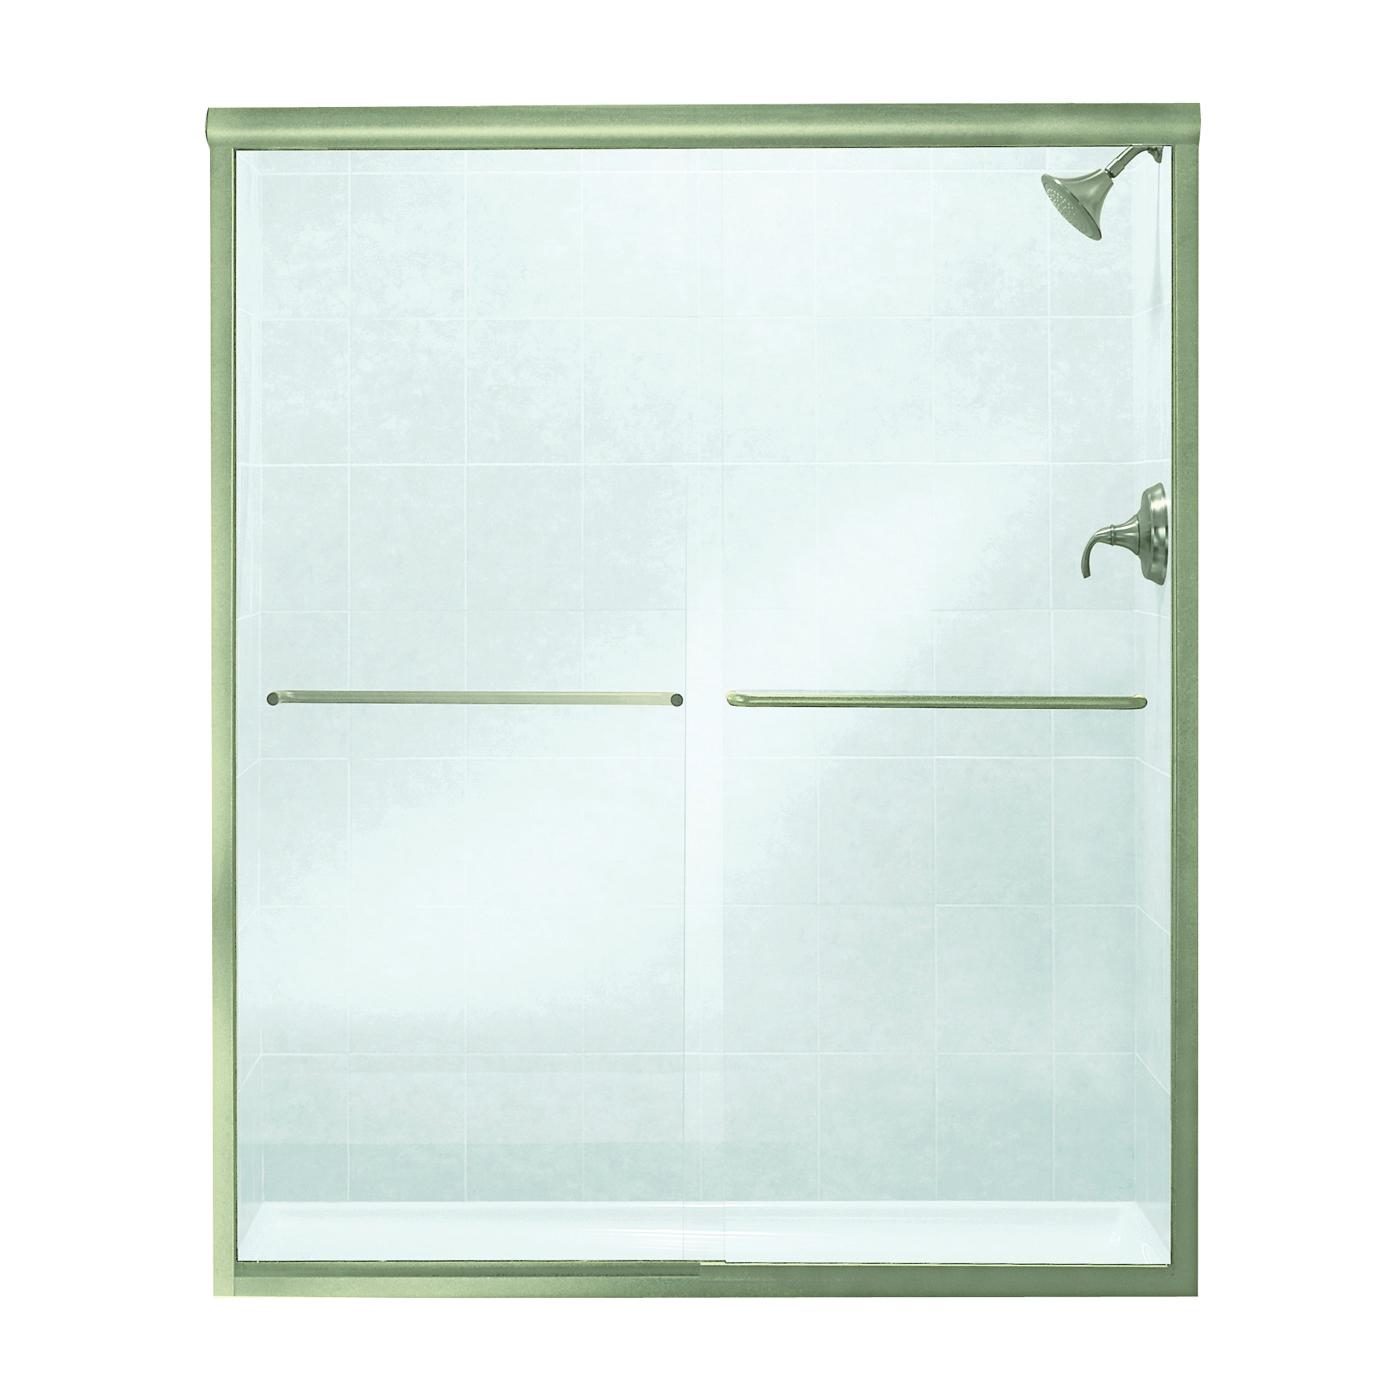 Picture of Sterling 5475-59N-G05 Shower Door, Clear Glass, Tempered Glass, Frameless Frame, Aluminum Frame, Stainless Steel